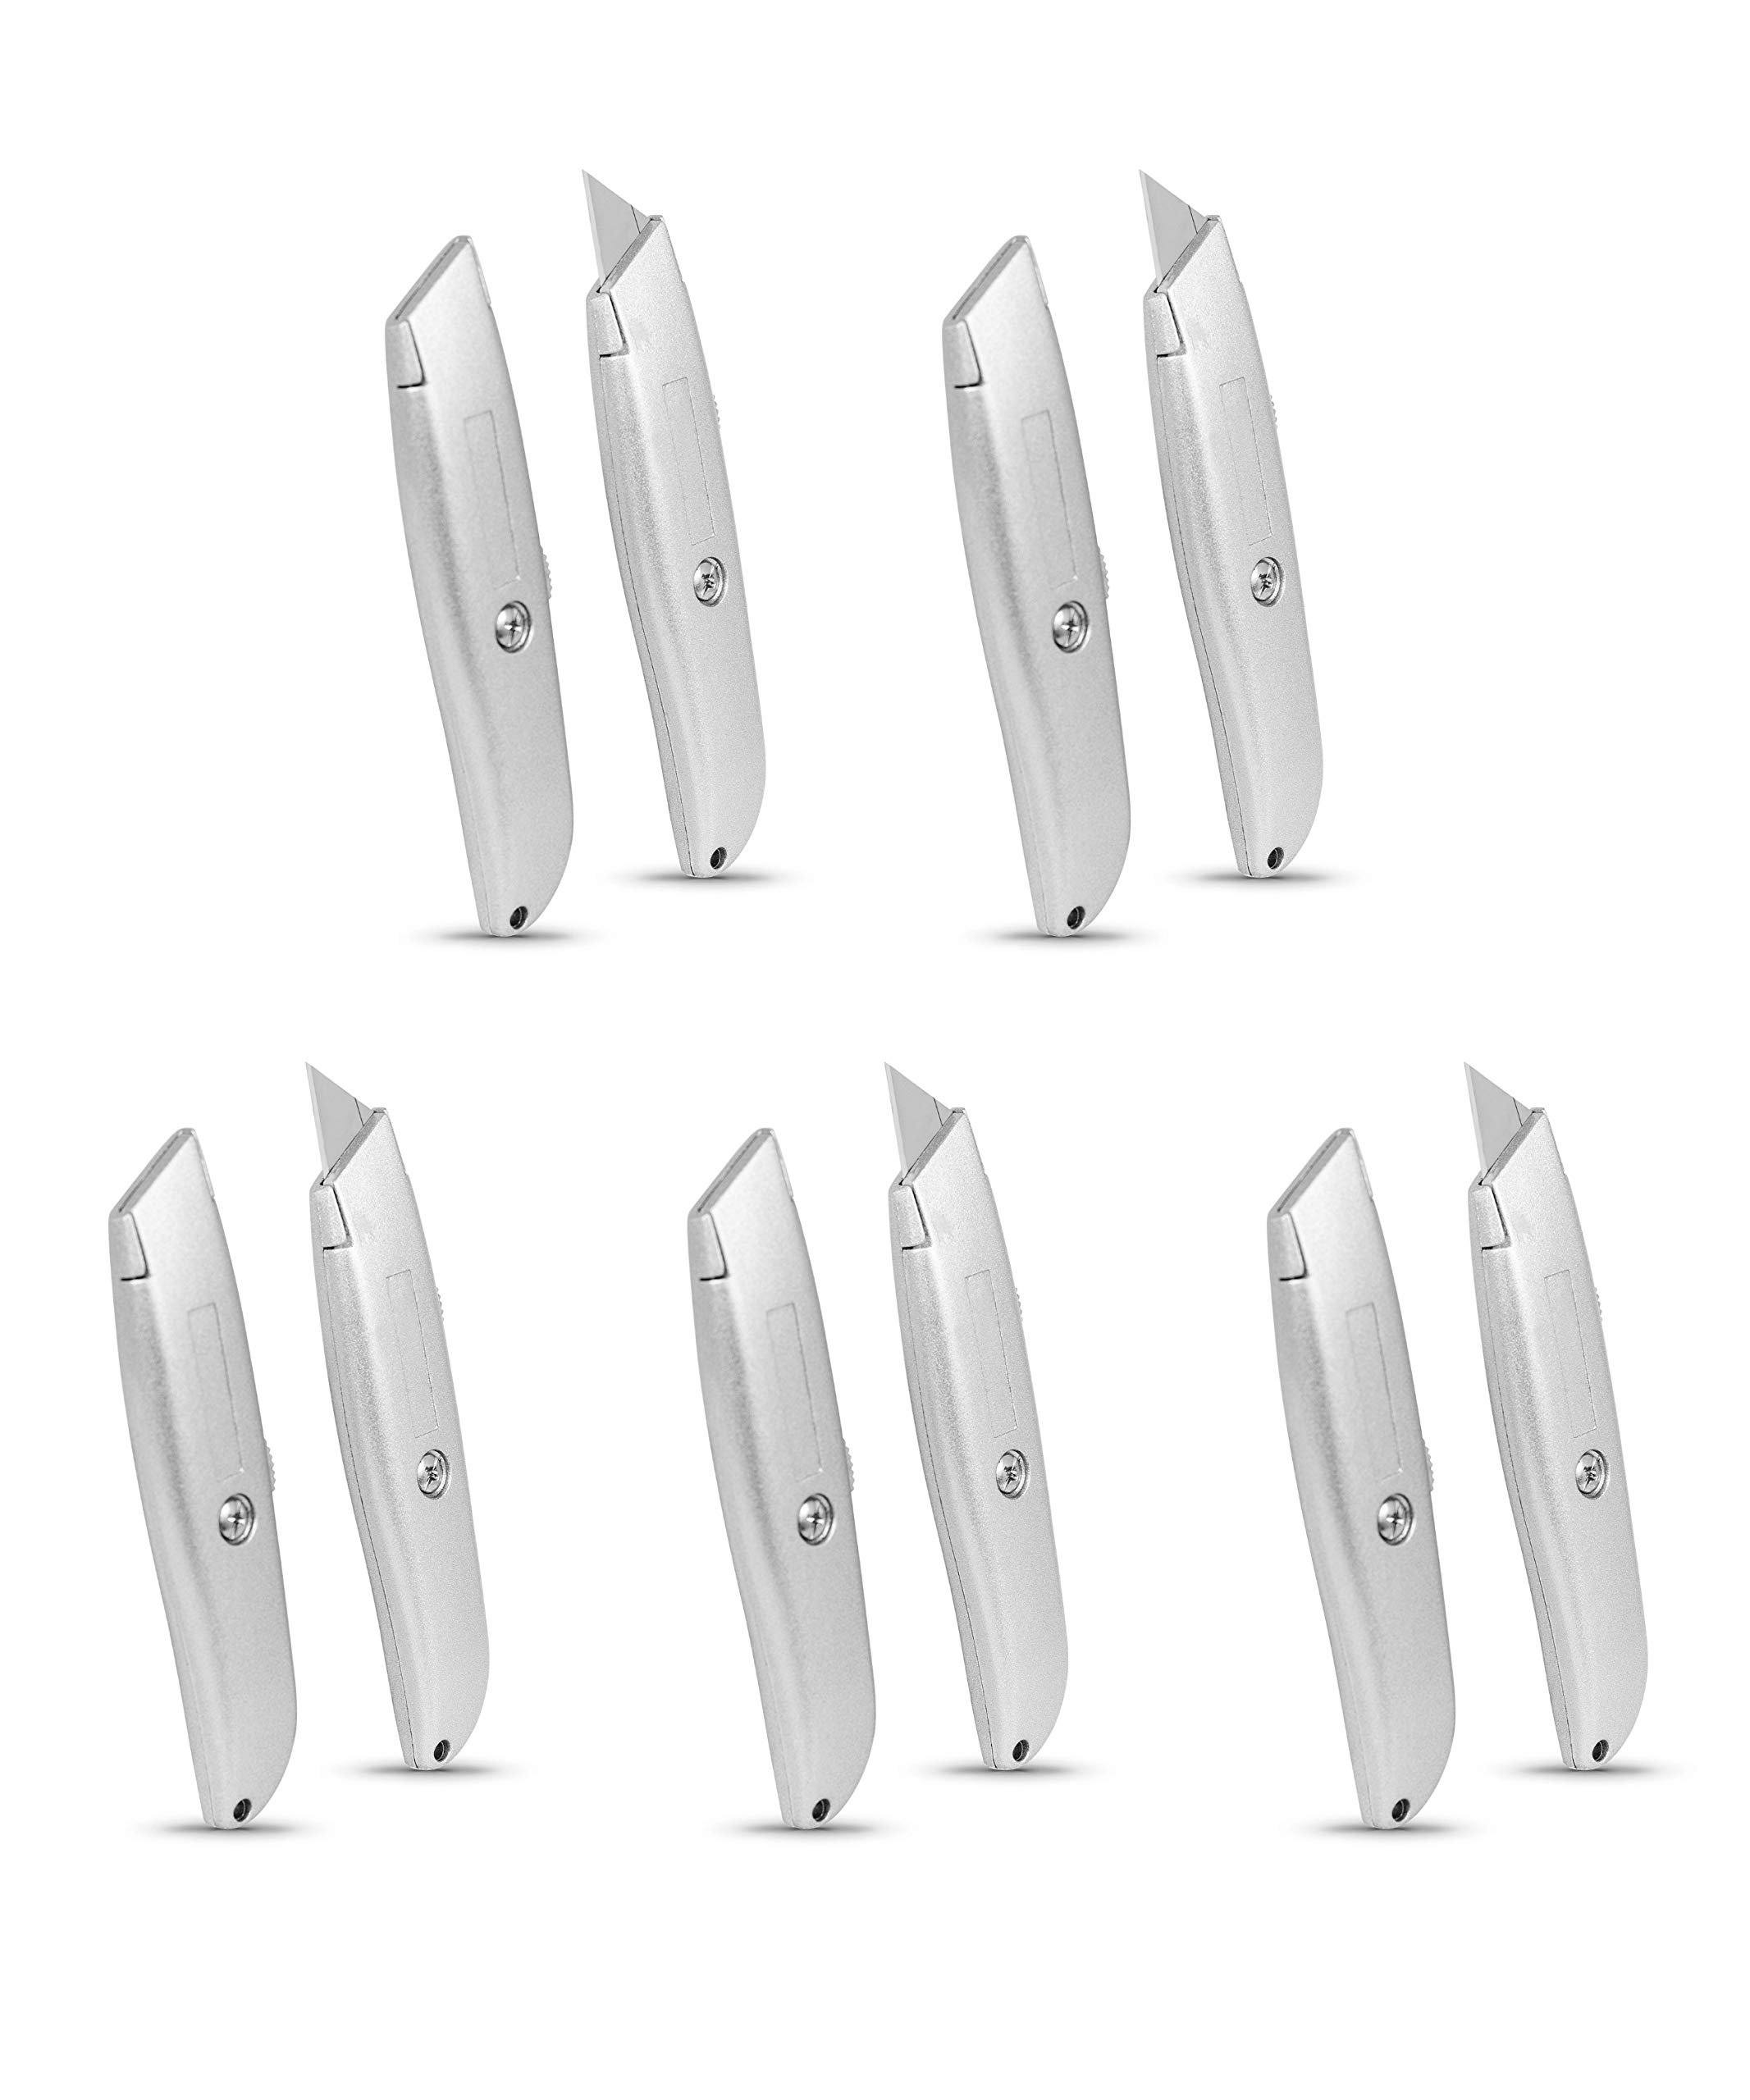 Internet's Best Classic Utility Knife - Set of 10 - Retractable Razor Knife Set - Extra Blade Refills - Box Cutter Locking Razor Knife - Full Metal Body - Silver by Internet's Best